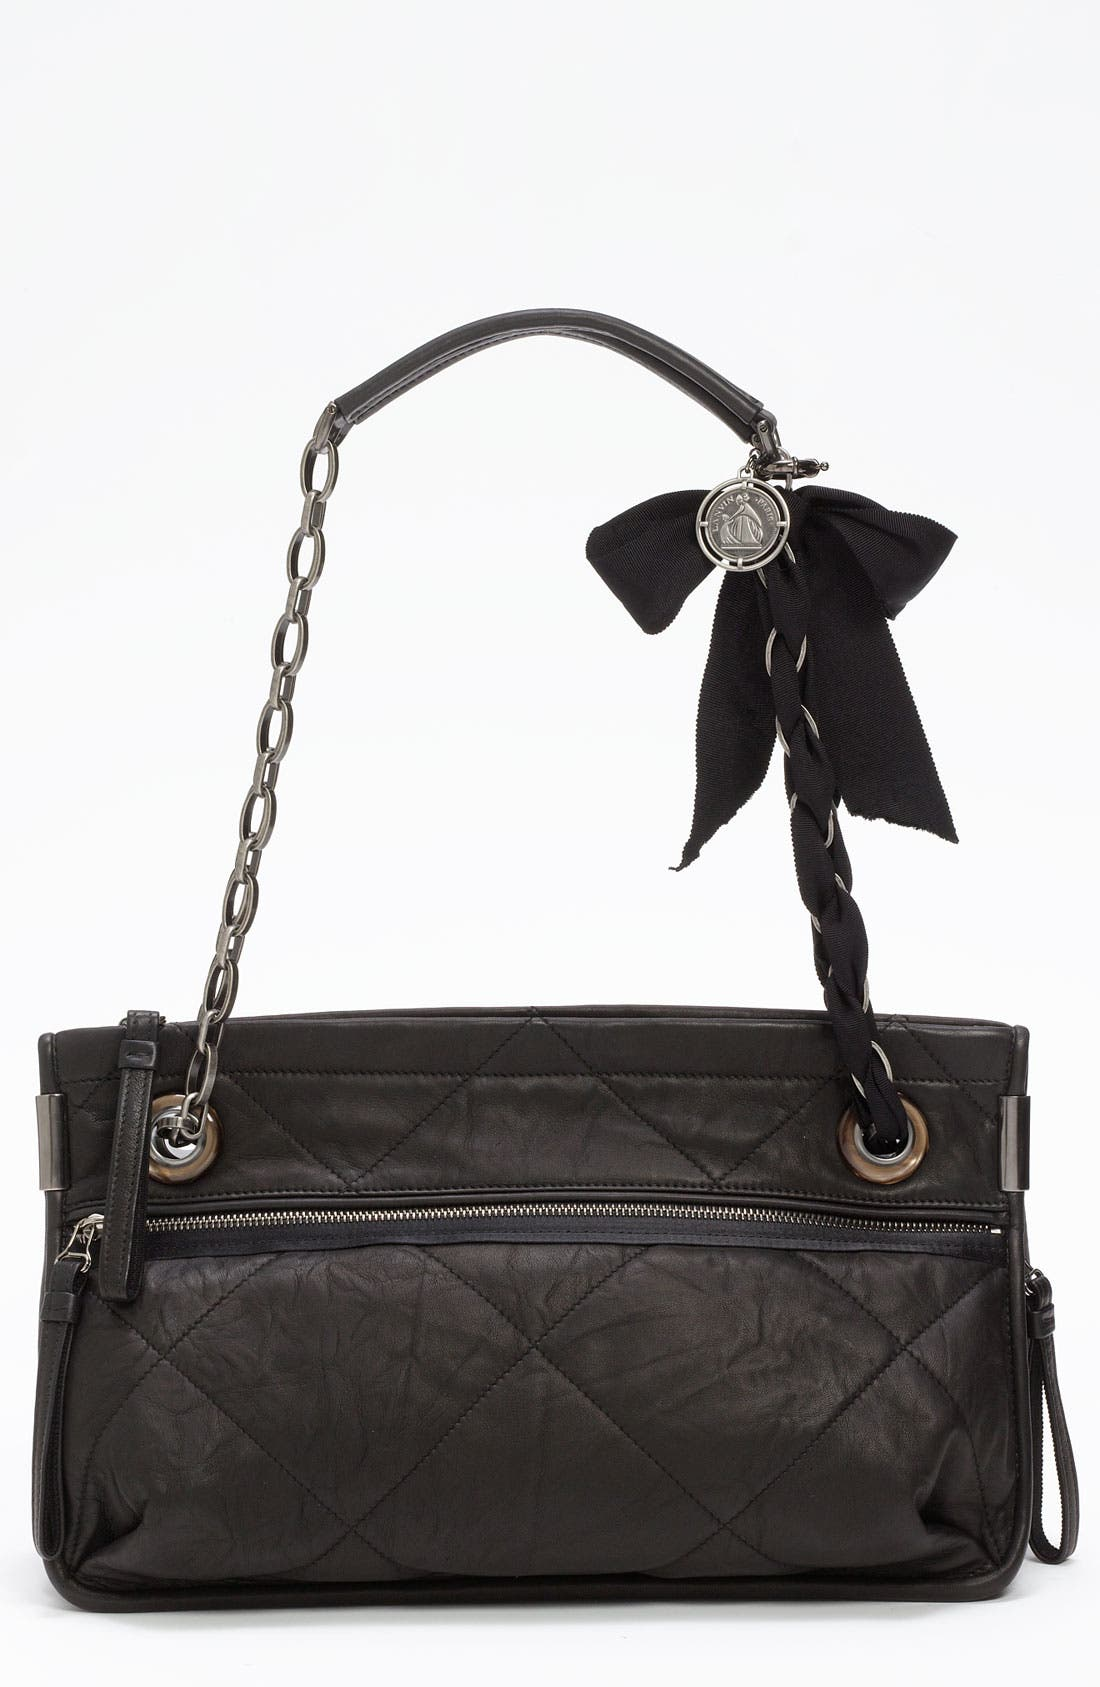 LANVIN 'Amalia - Medium' Leather Shoulder Bag, Main, color, 001